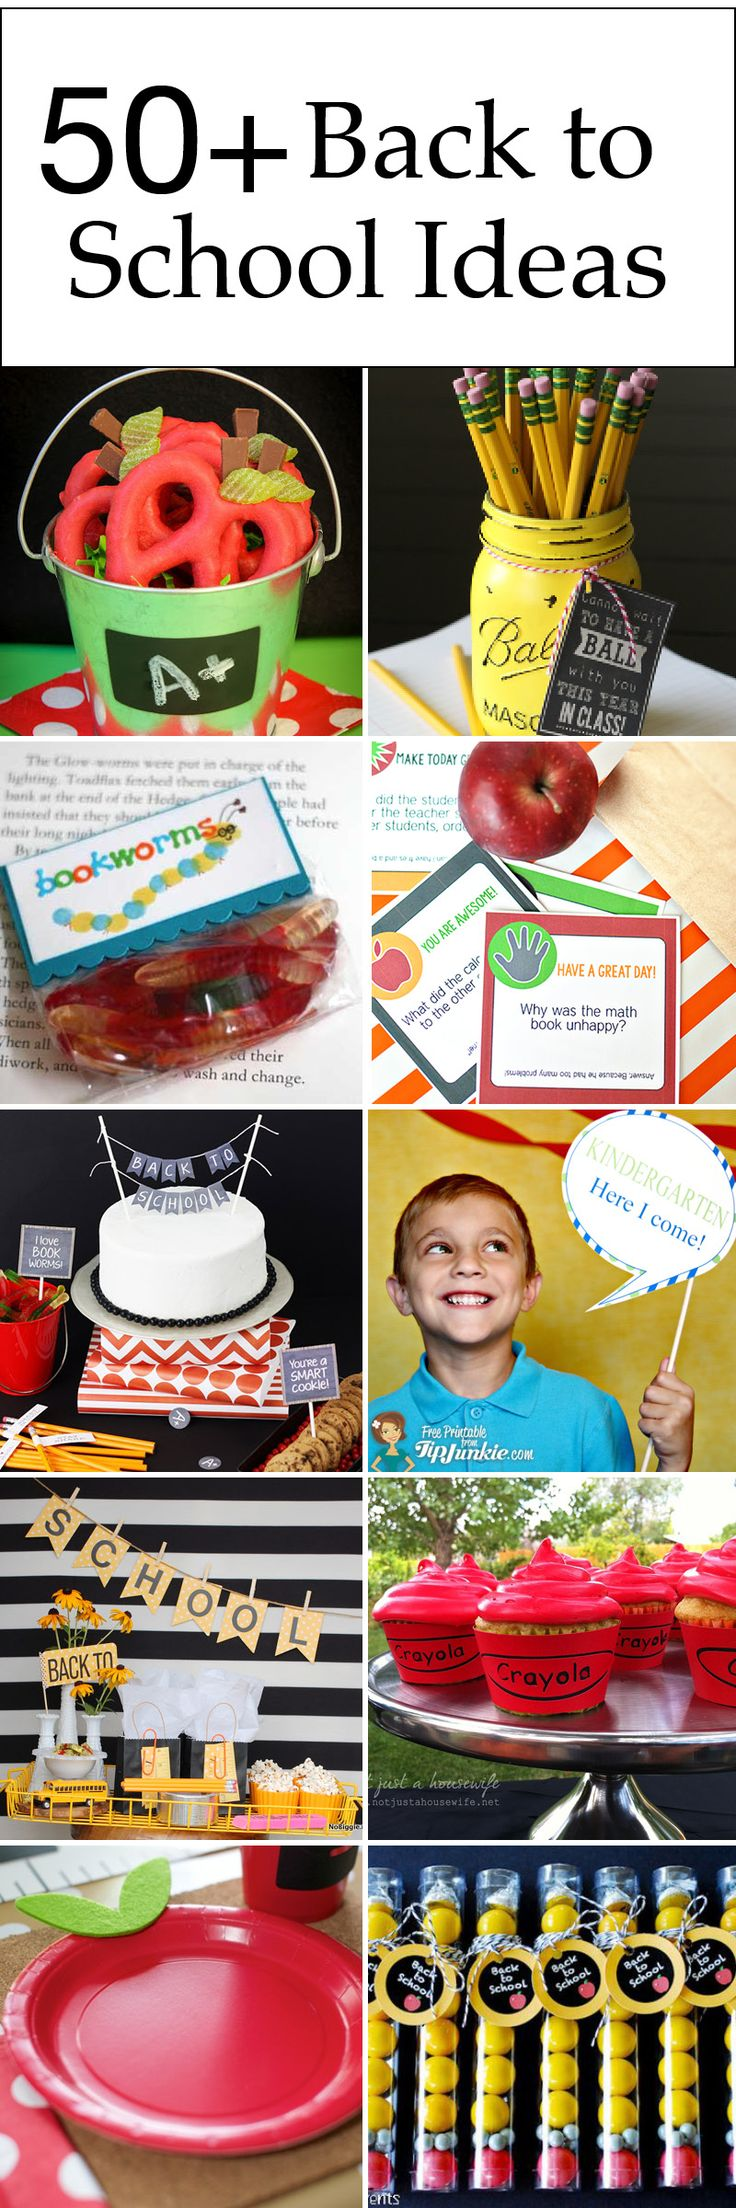 back to school ideas - lunch ideas, party ideas, teacher gift ideas, first day…